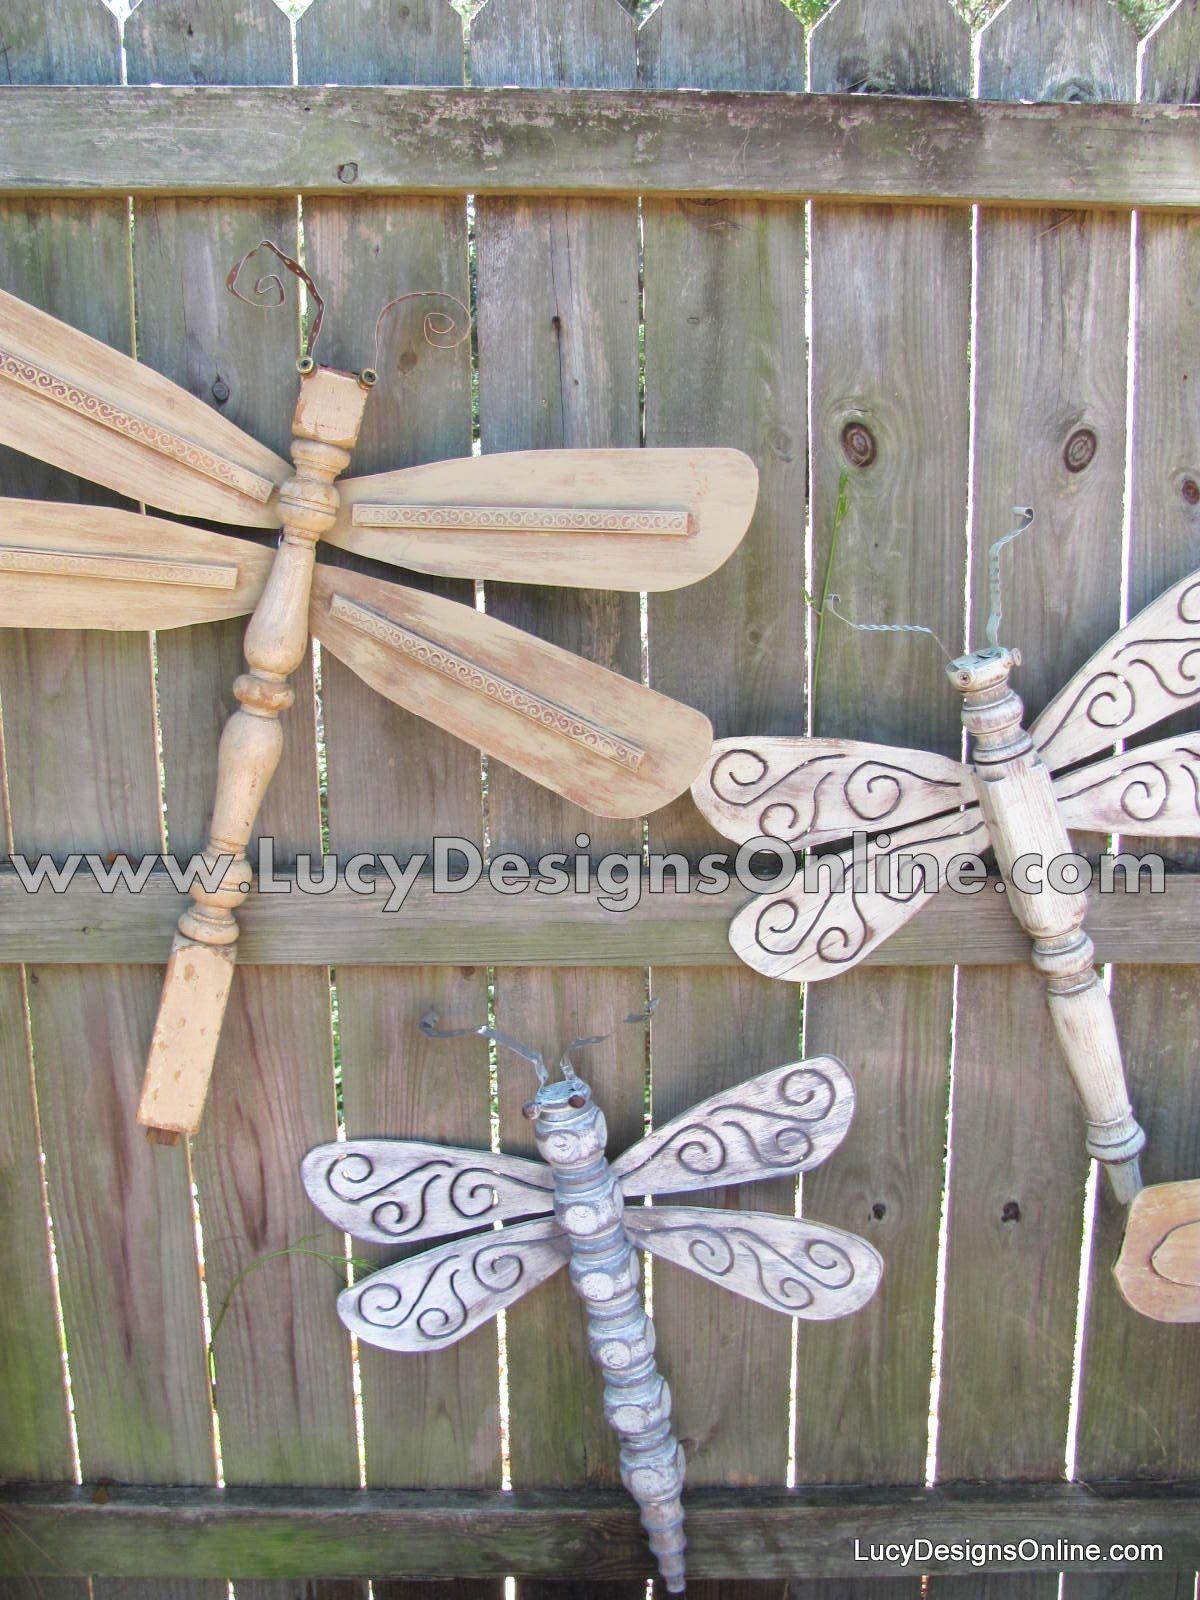 Original Table Leg Dragonflies